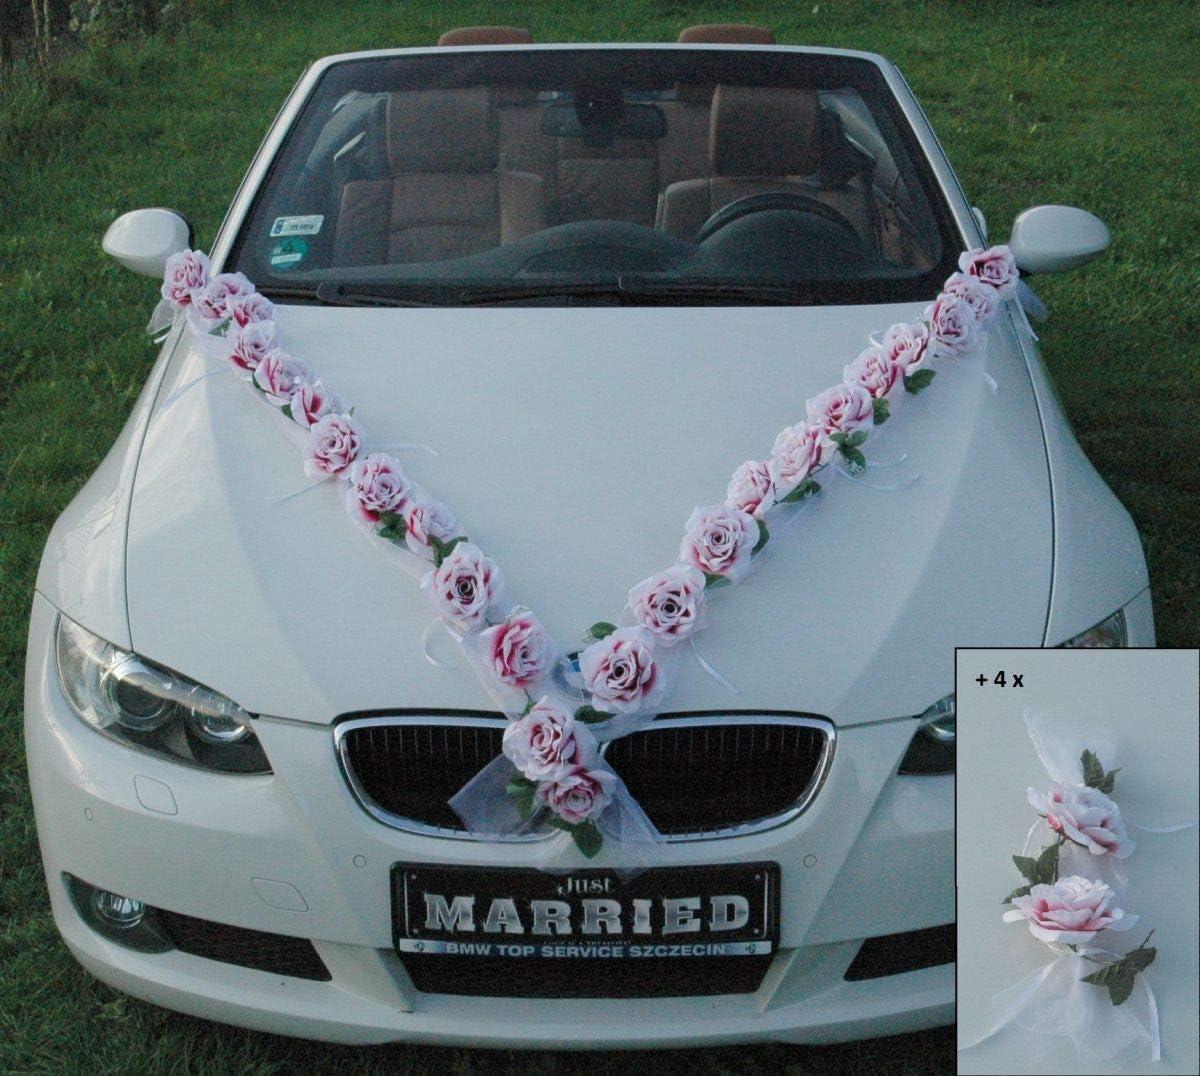 Pink//White Auto-schmuck Car Decoration Rose Garland Bride Couple Rose Decoration Wedding Car Wedding Decoration